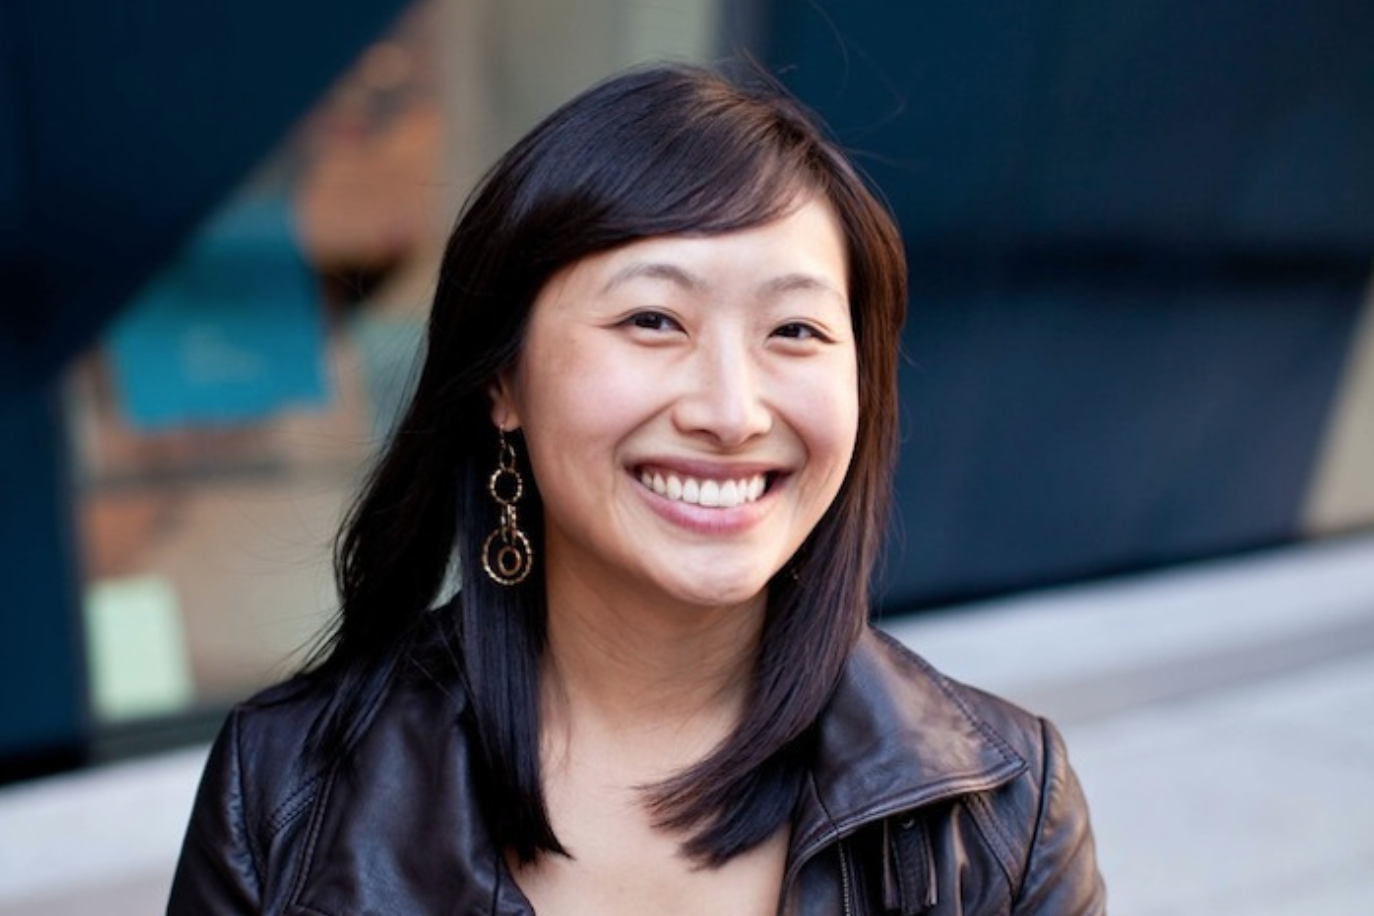 MEET A LOCAL: Fiona Tang